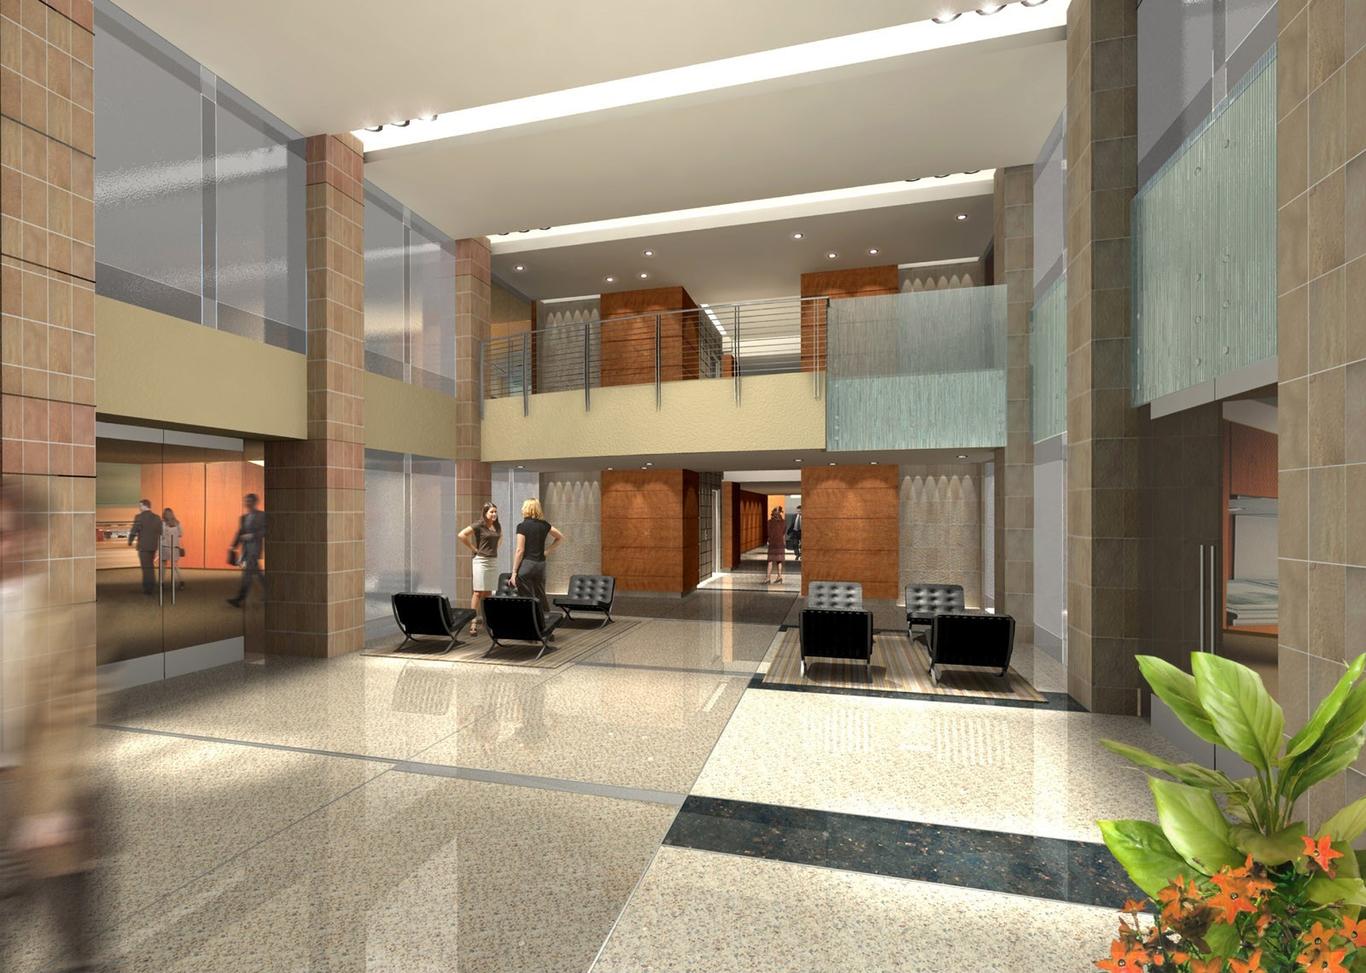 Tsmith office lobby 1 934de320 y7a9